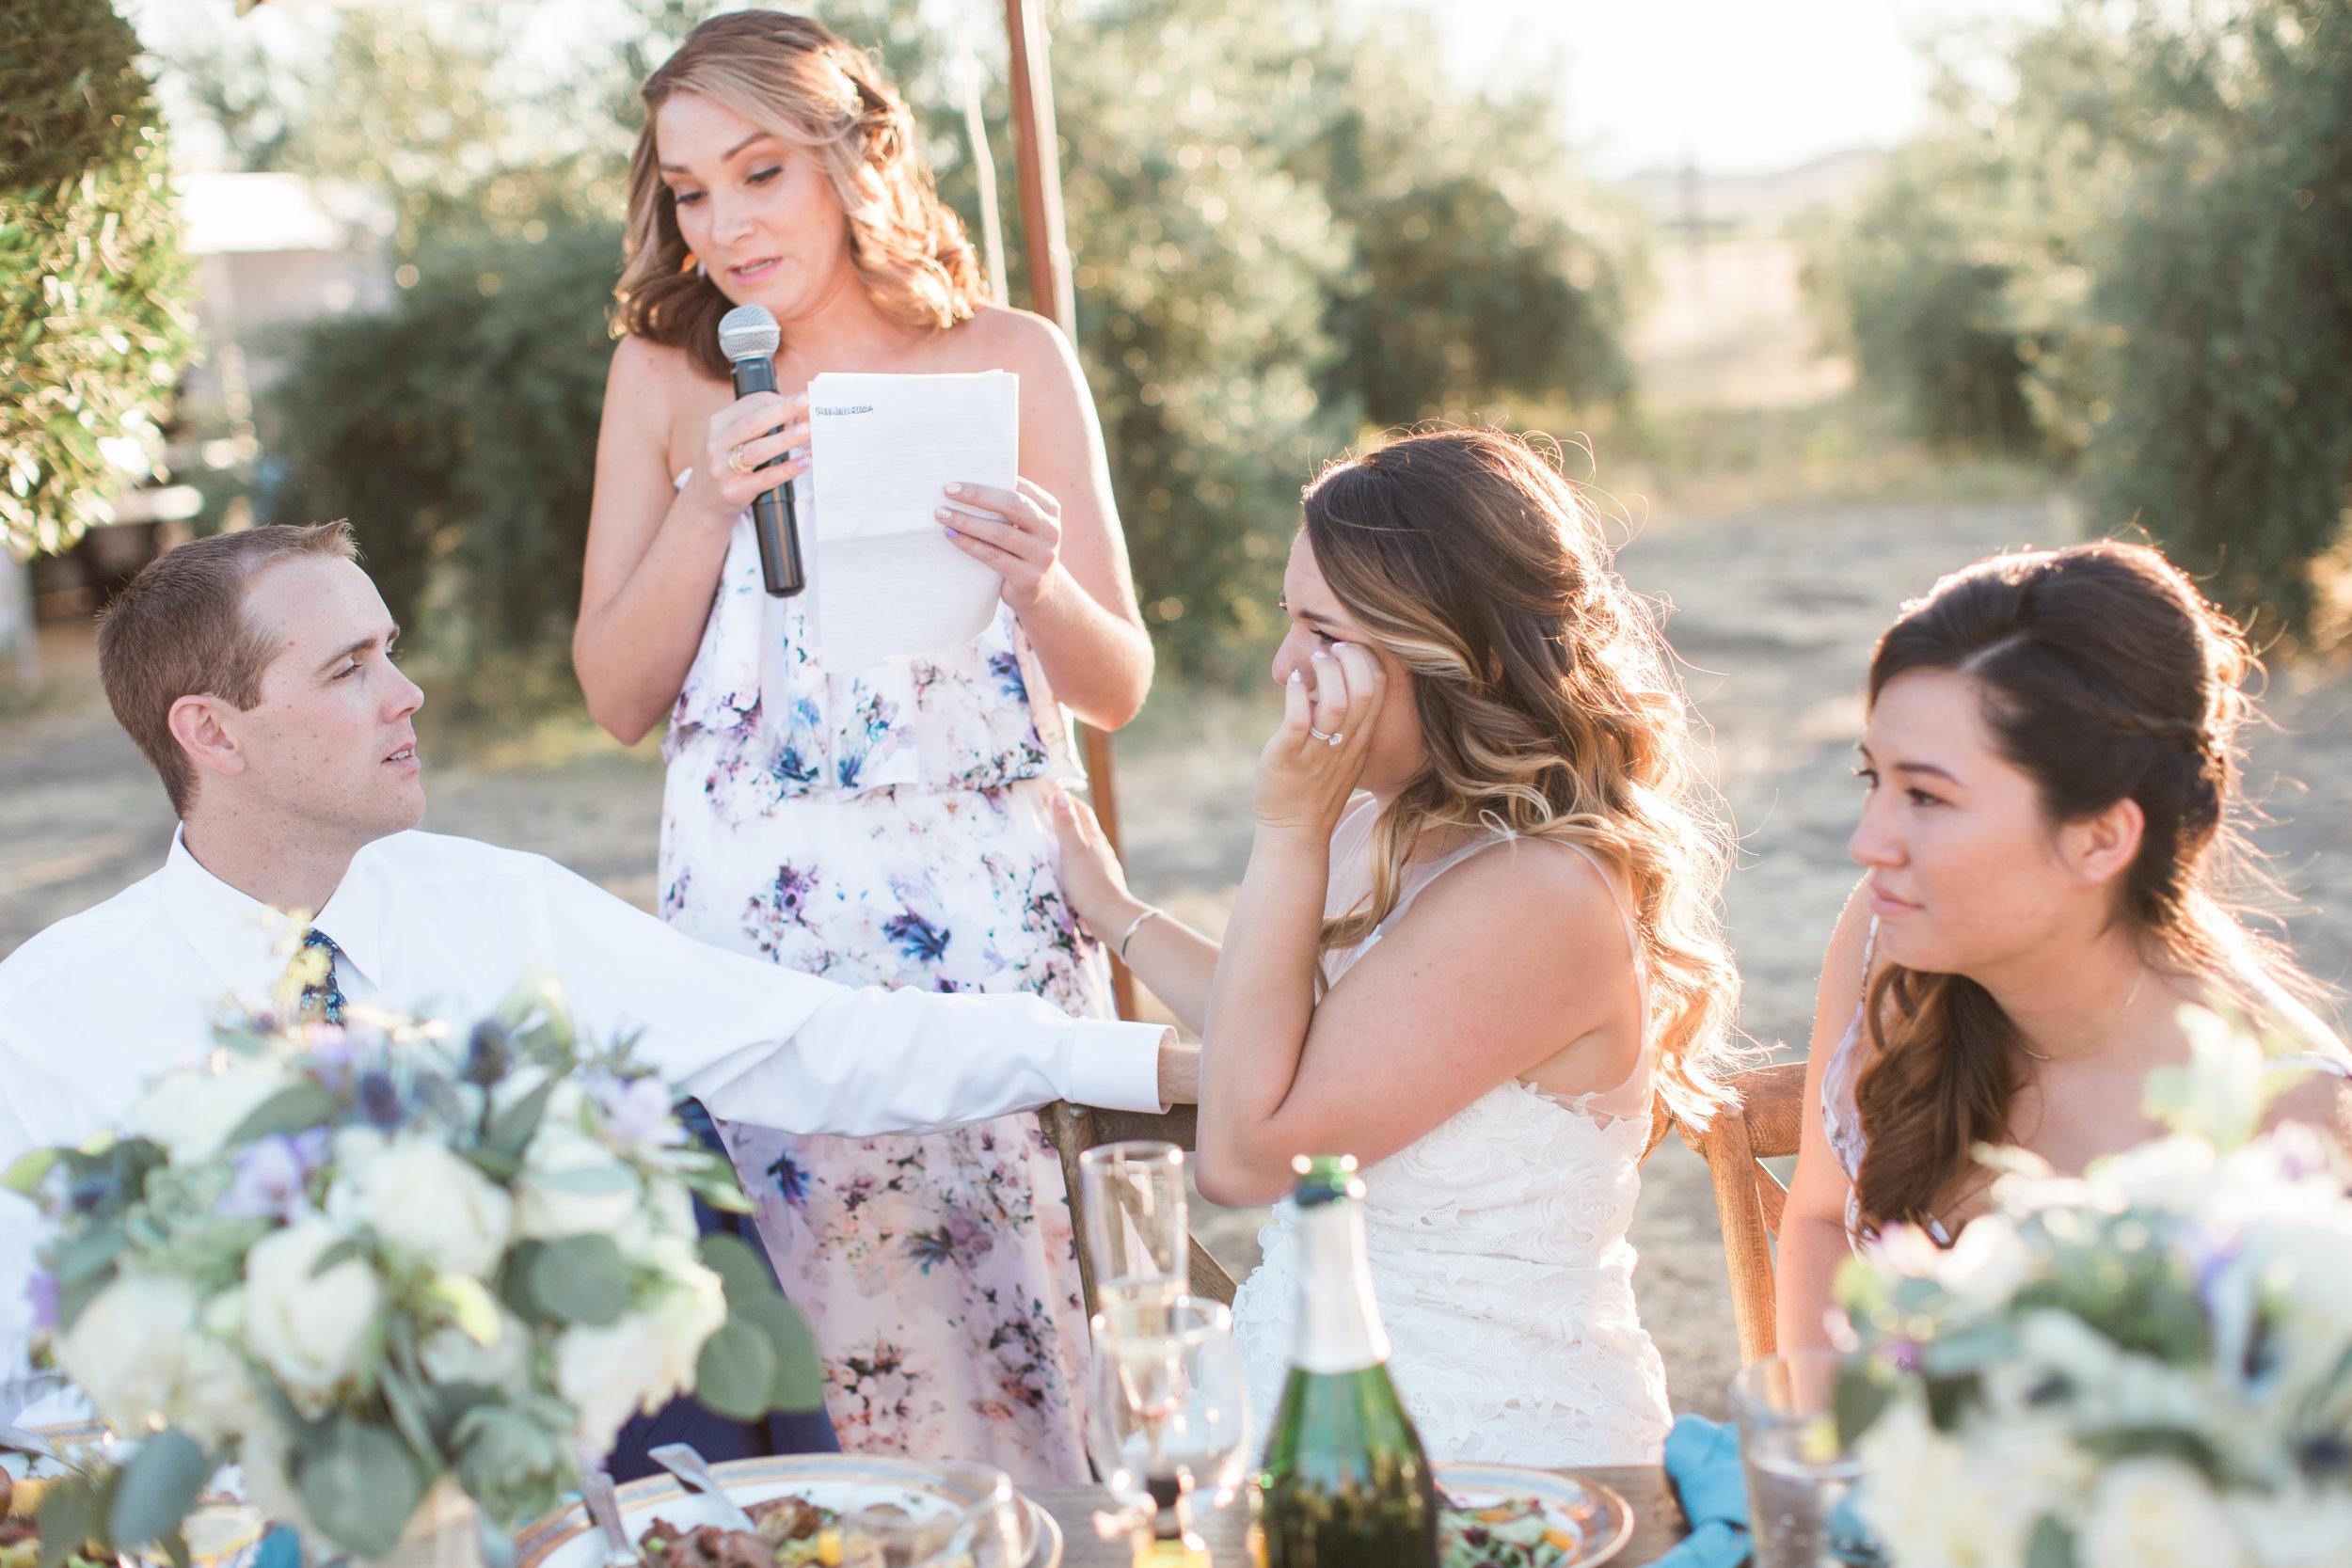 the-purple-orchid-resort-wedding-in-livermore-california-17.jpg